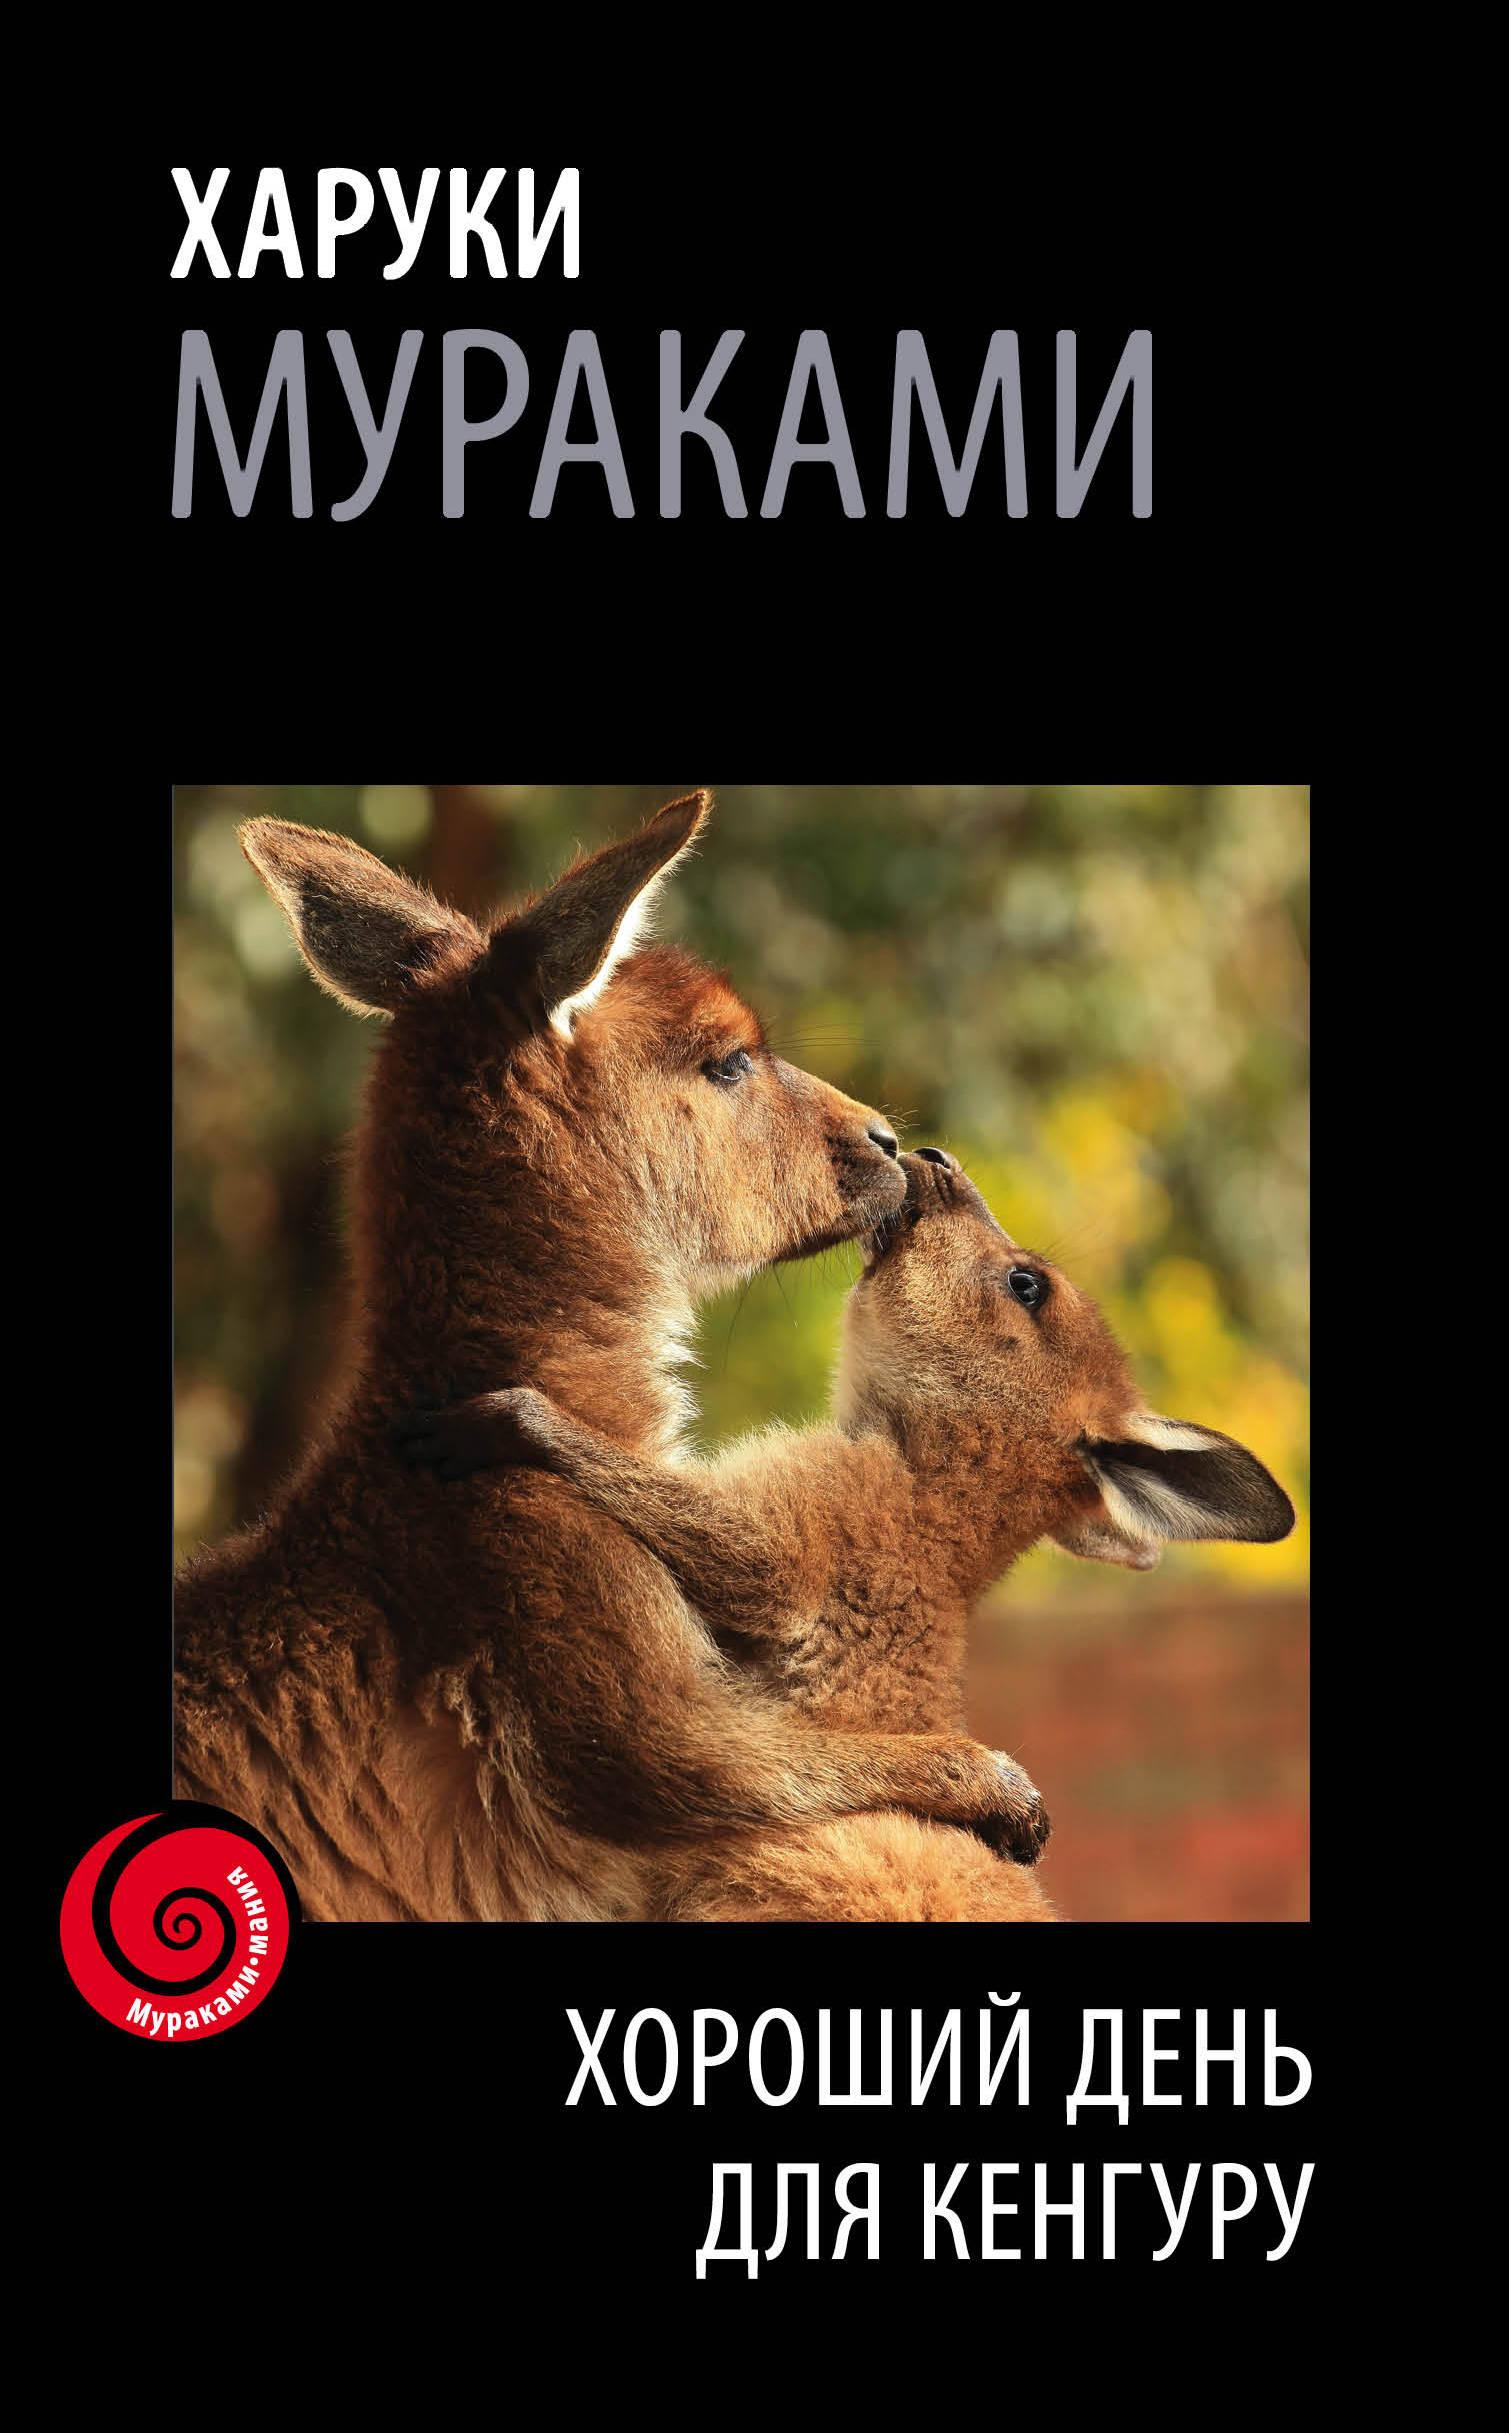 Харуки Мураками Хороший день для кенгуру (сборник) мураками х хороший день для кенгуру